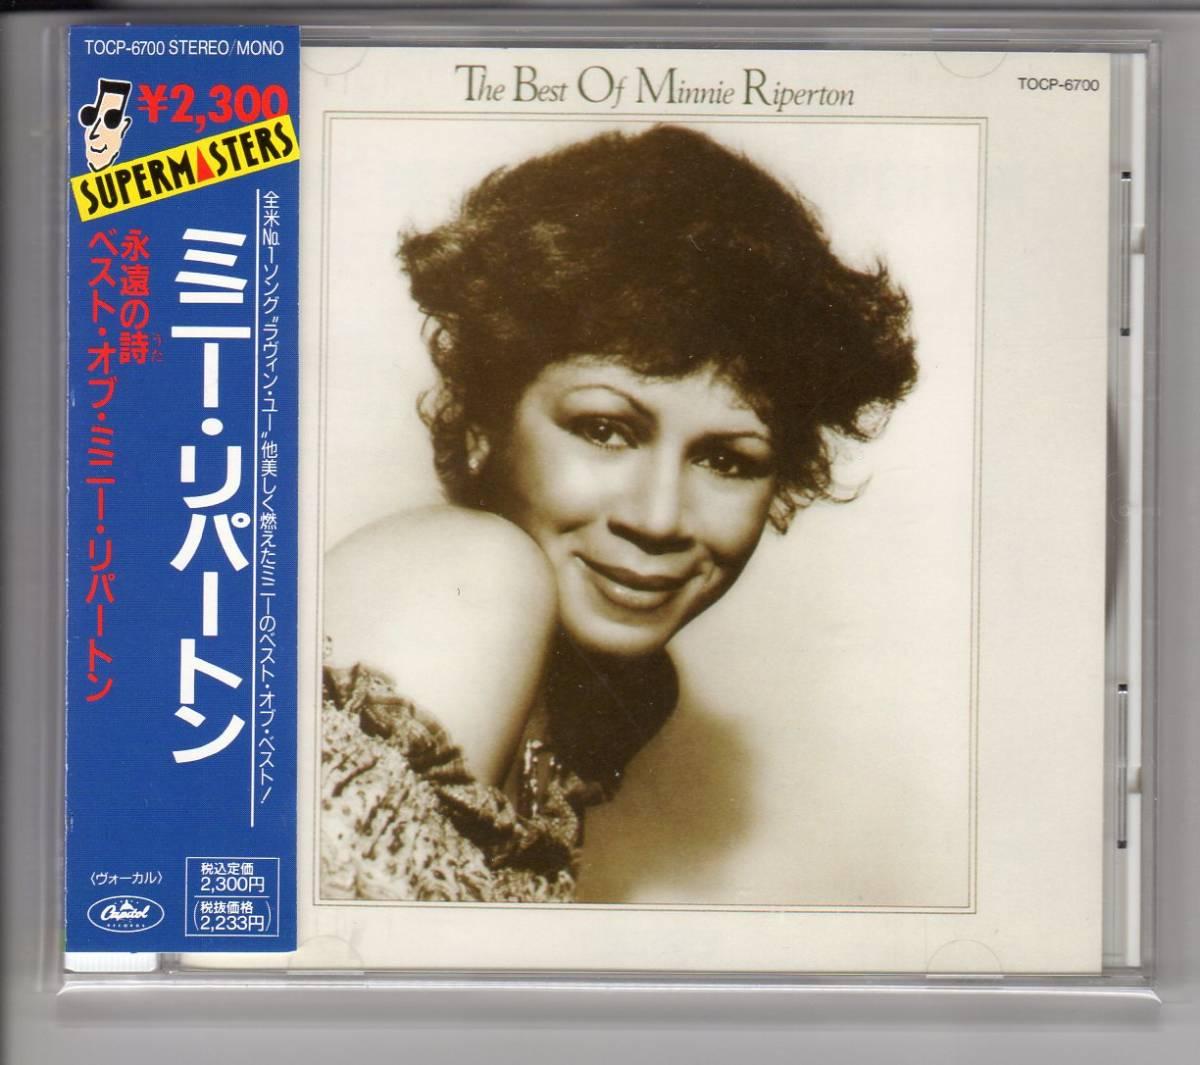 CD 帯付き 「永遠の詩~ベスト・オブ・ミニー・リパートン」ミニー・リパートン(「The Best Of Minnie Riperton」MINNIE RIPERTON )